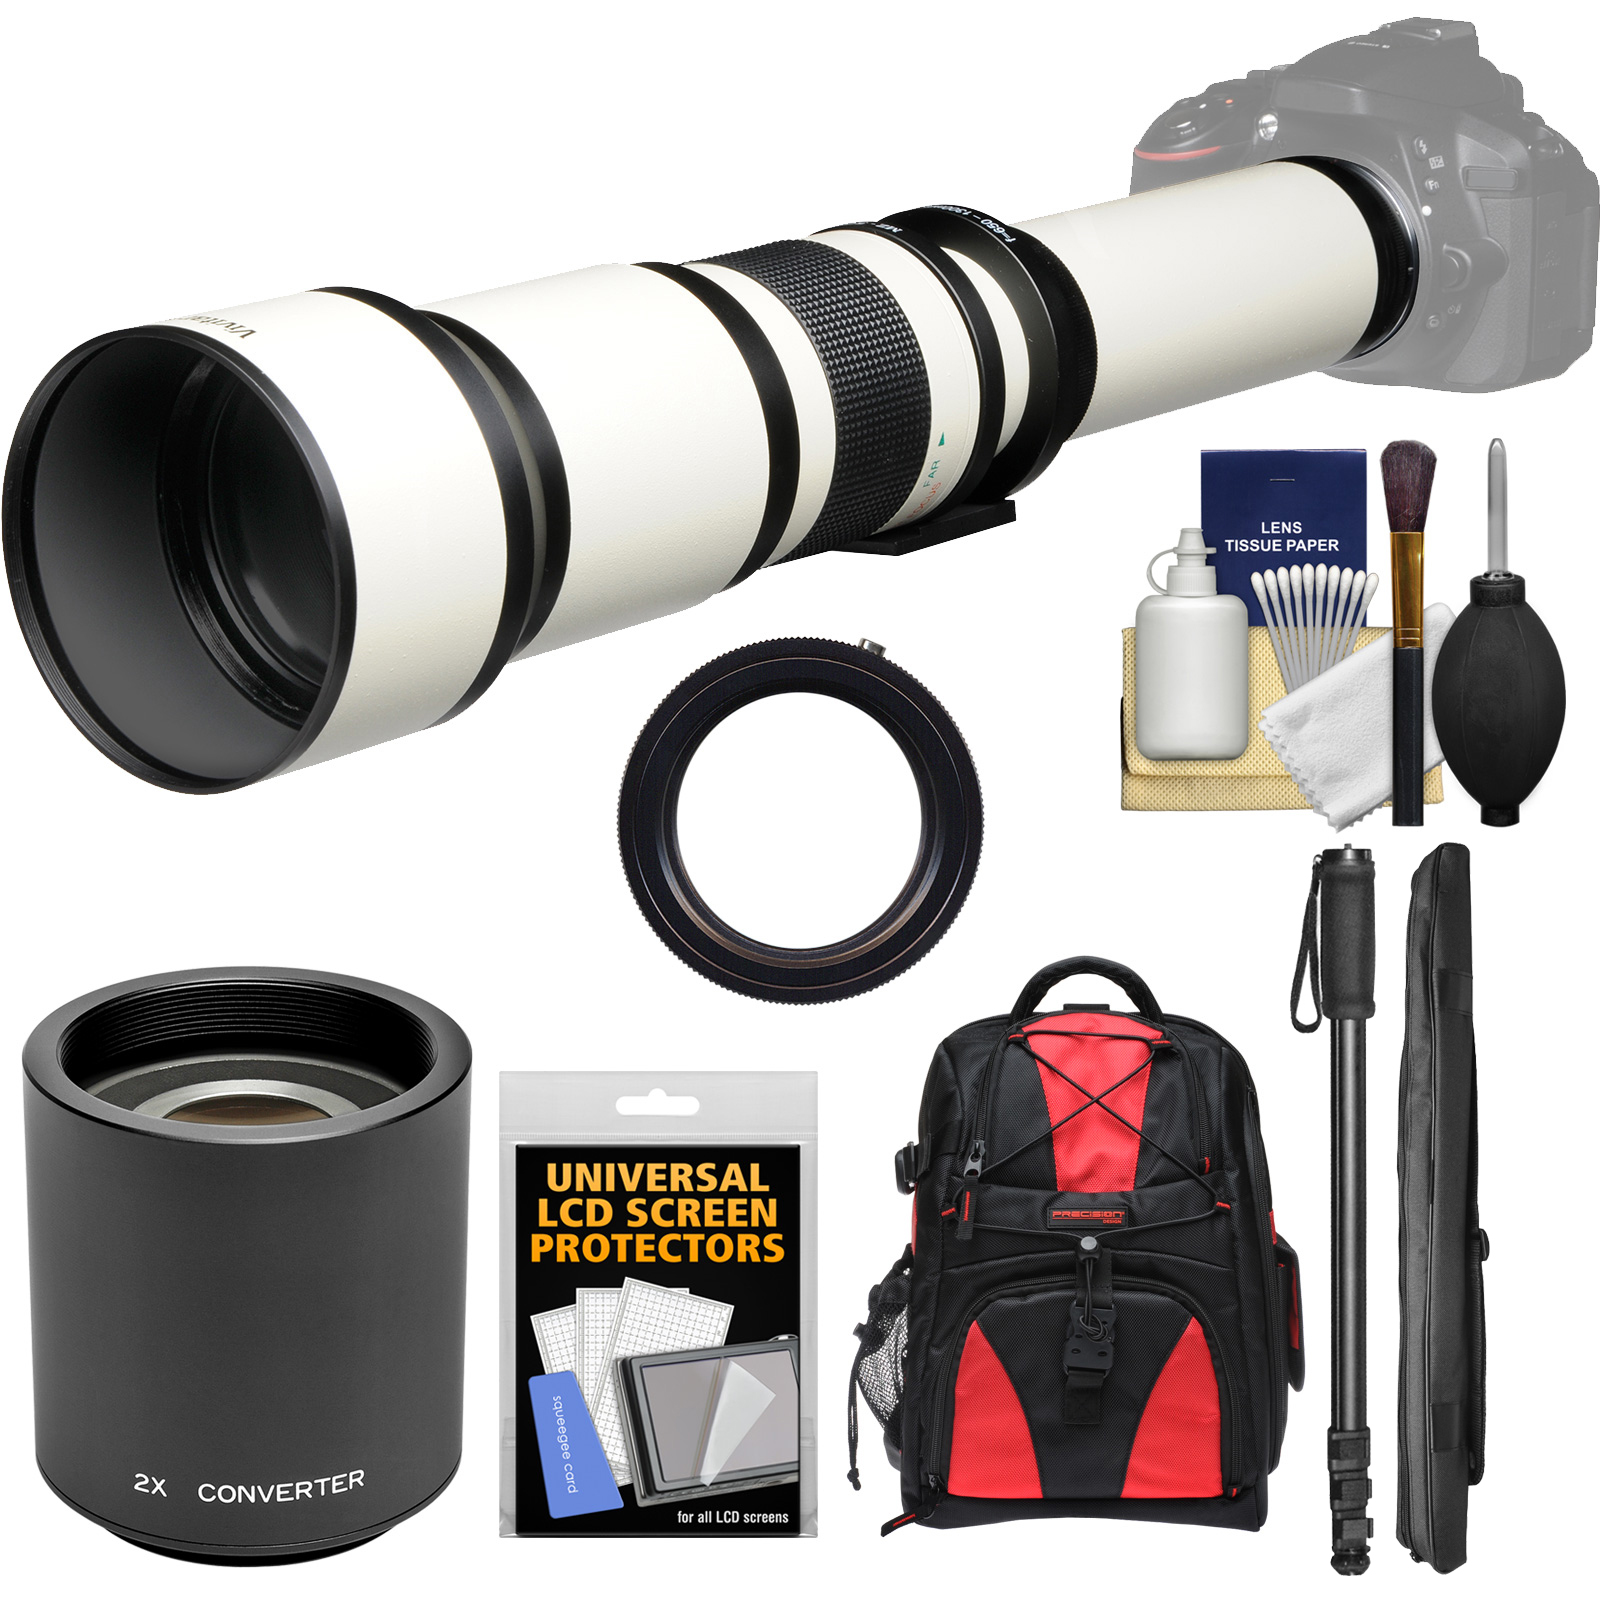 Vivitar 650 - 1300mm f / 8 - 16 Telephoto Lens (White) (T Mount) with 2x Teleconverter (=2600mm) + Monopod + Backpack + Kit for Nikon D3200, D3300, D5300, D5500, D7100, D7200, D610, D750, D810 Camera